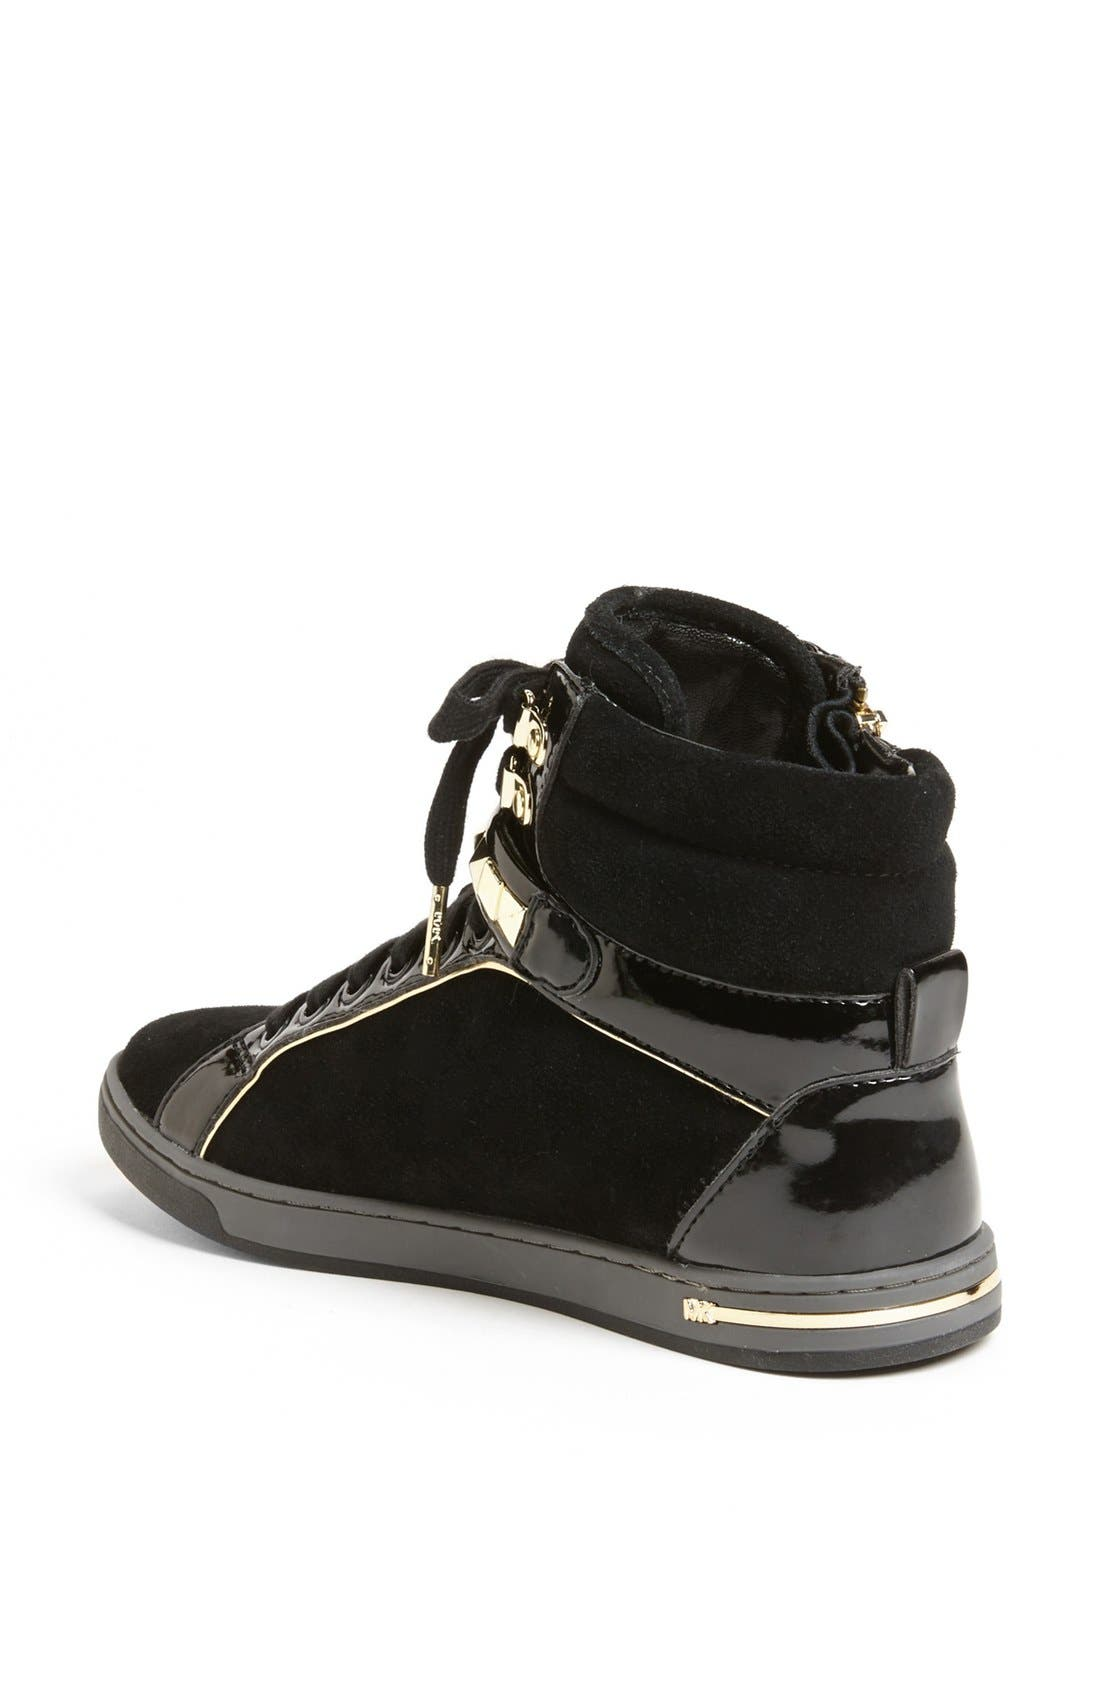 Alternate Image 2  - MICHAEL Michael Kors 'Glam' Studded High Top Sneaker